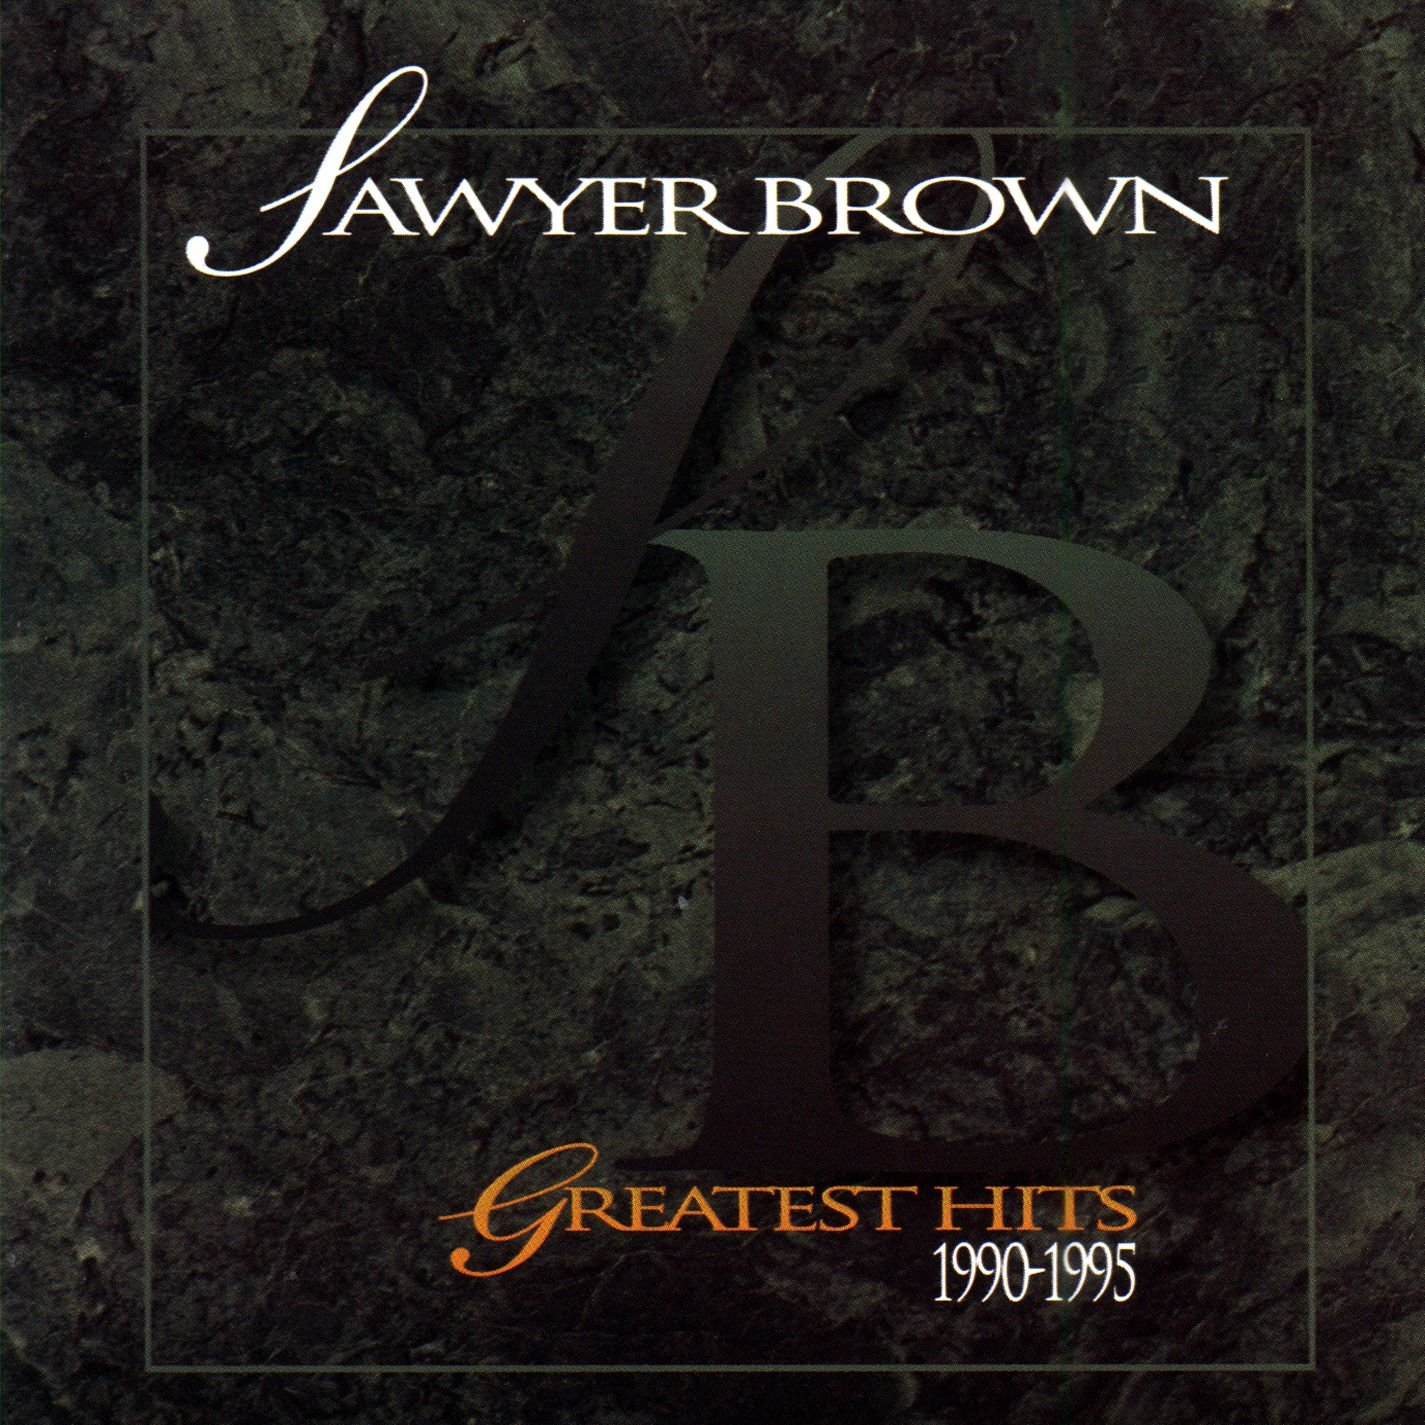 CD : Sawyer Brown - Greatest Hits 1990-1995 (CD)